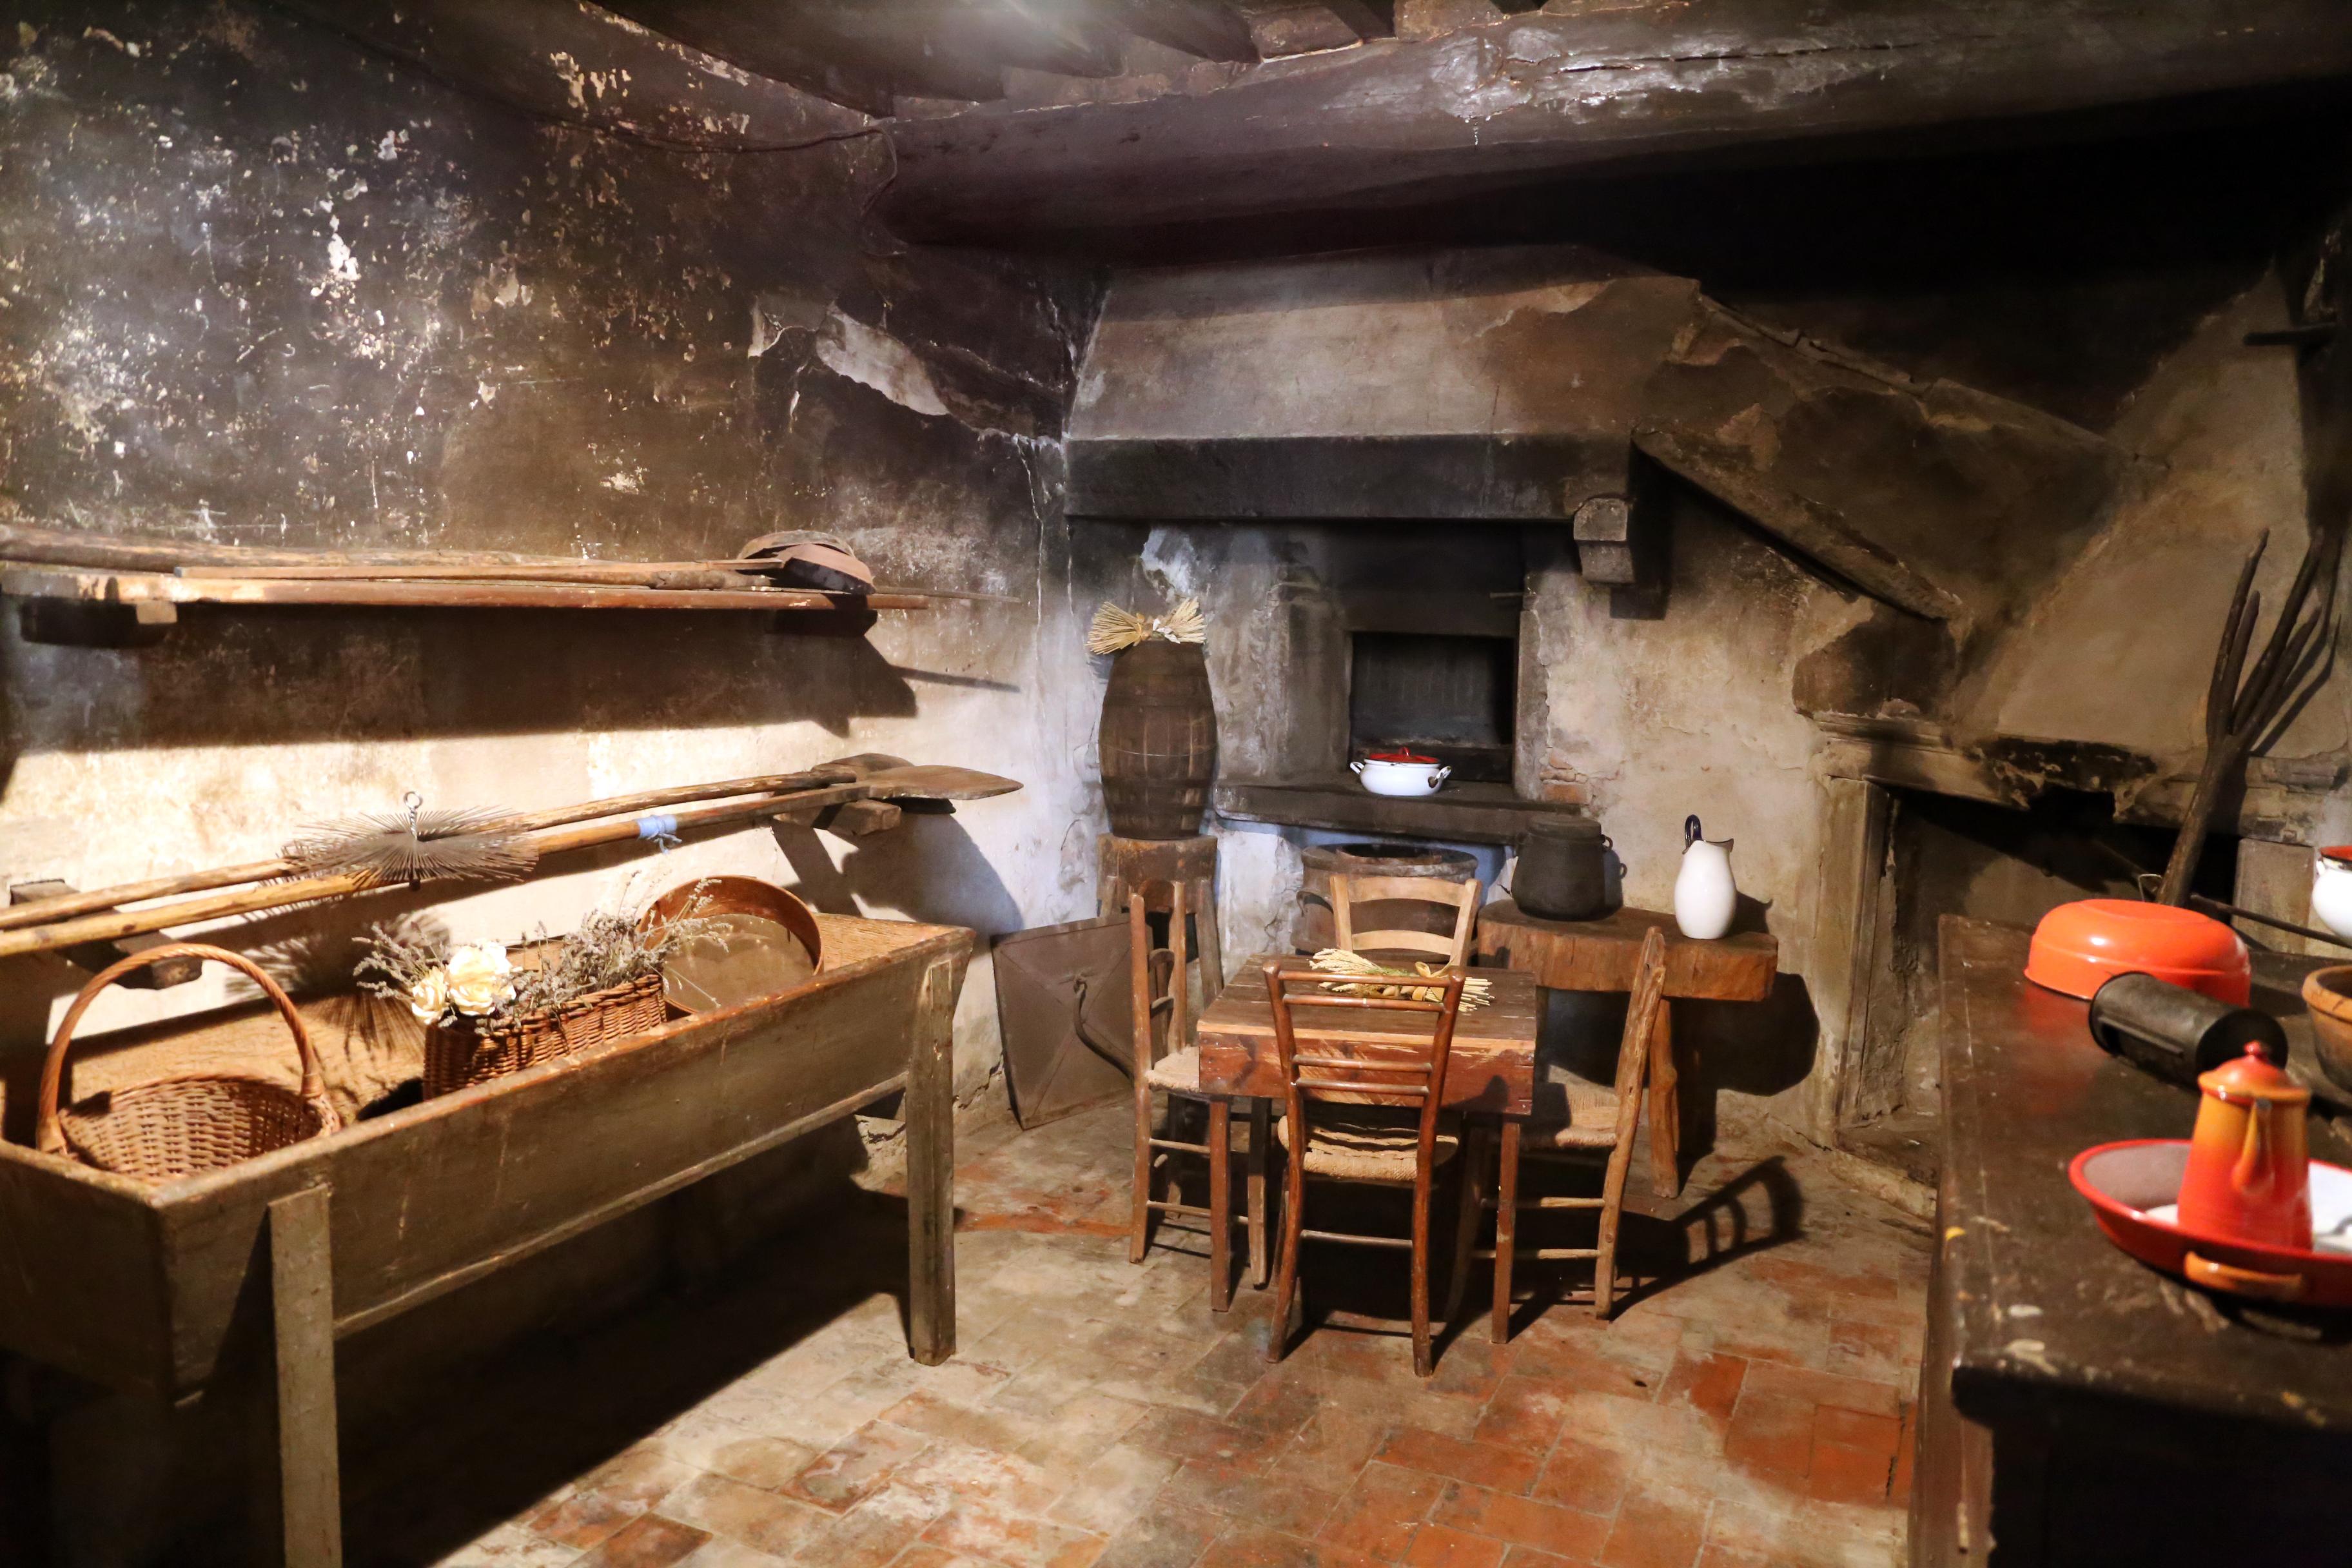 File:Bosco ai frati, vecchia cucina 01.jpg - Wikimedia Commons